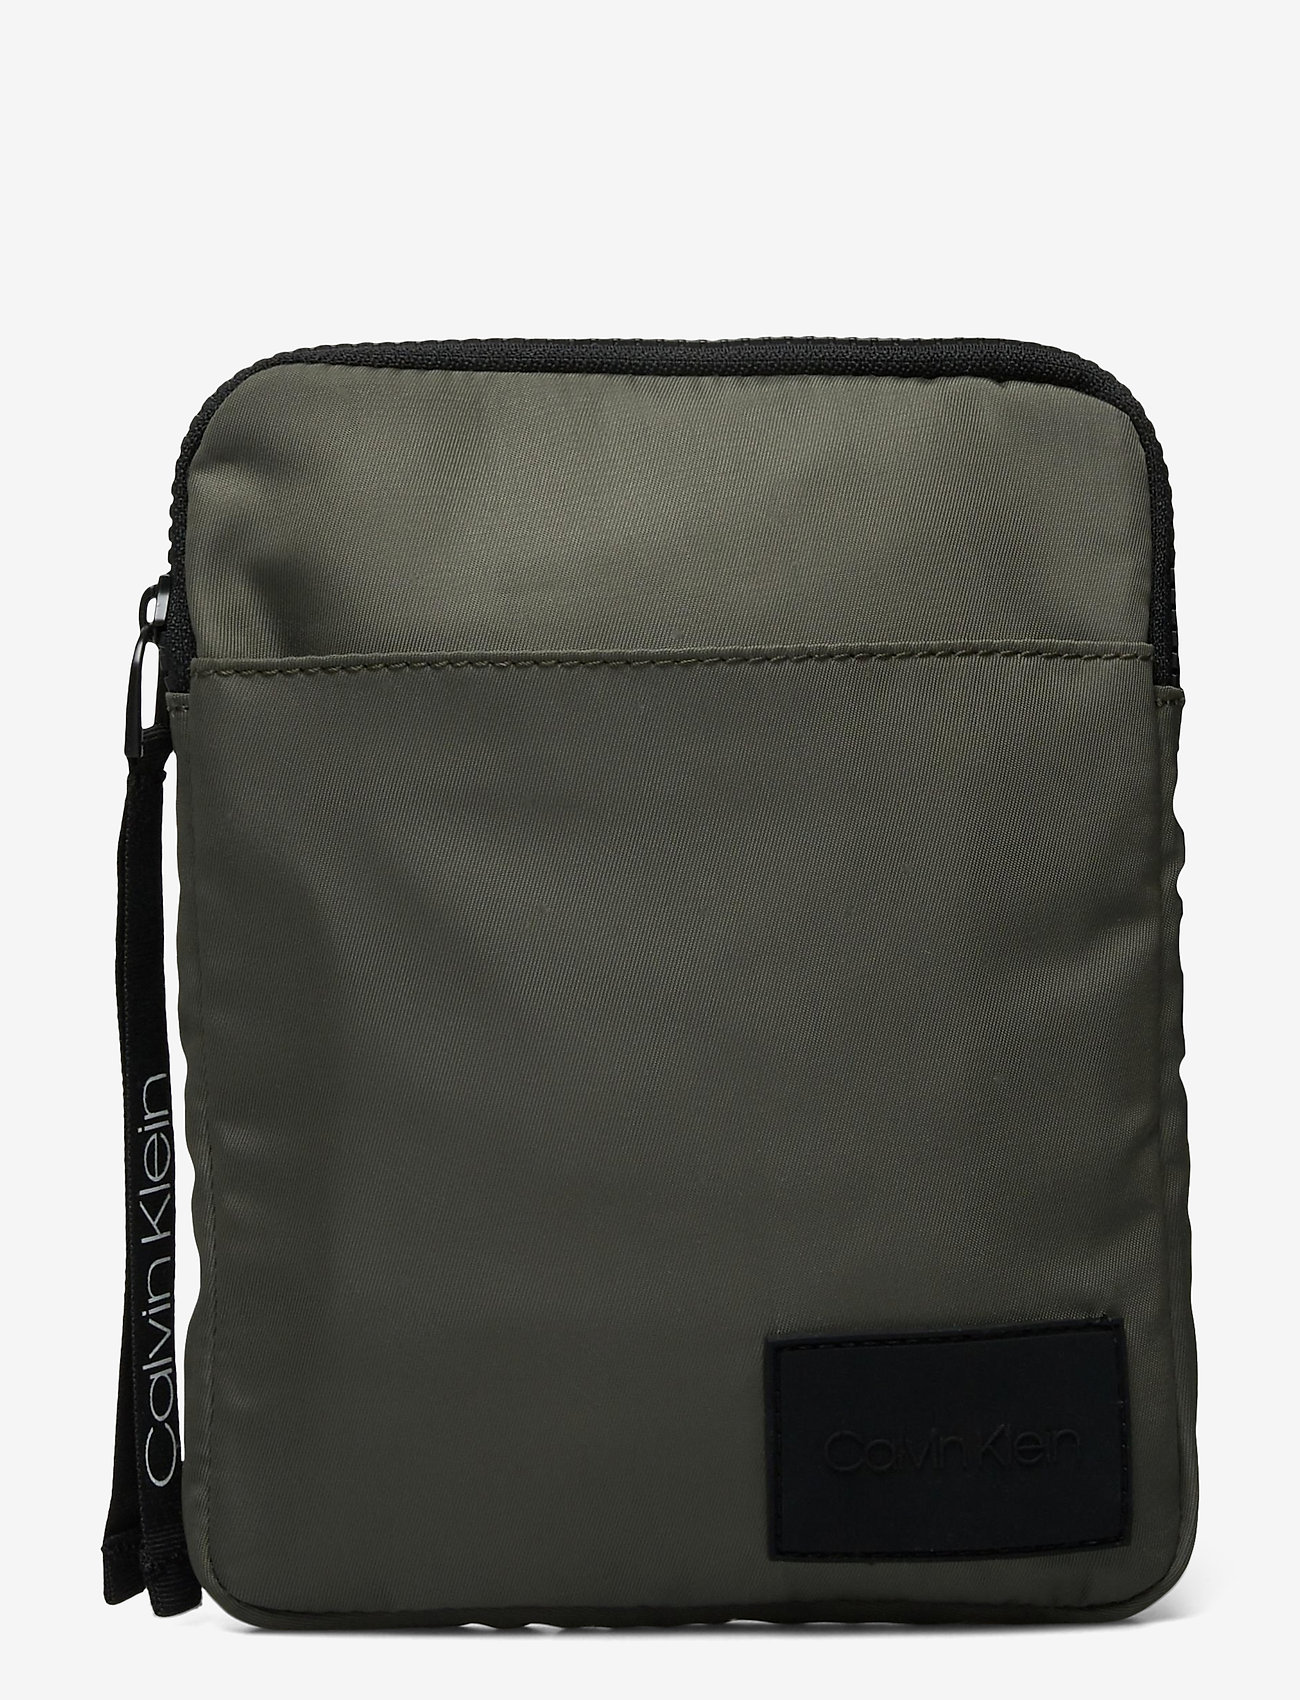 Calvin Klein - FLAT PACK S - shoulder bags - dark olive - 0